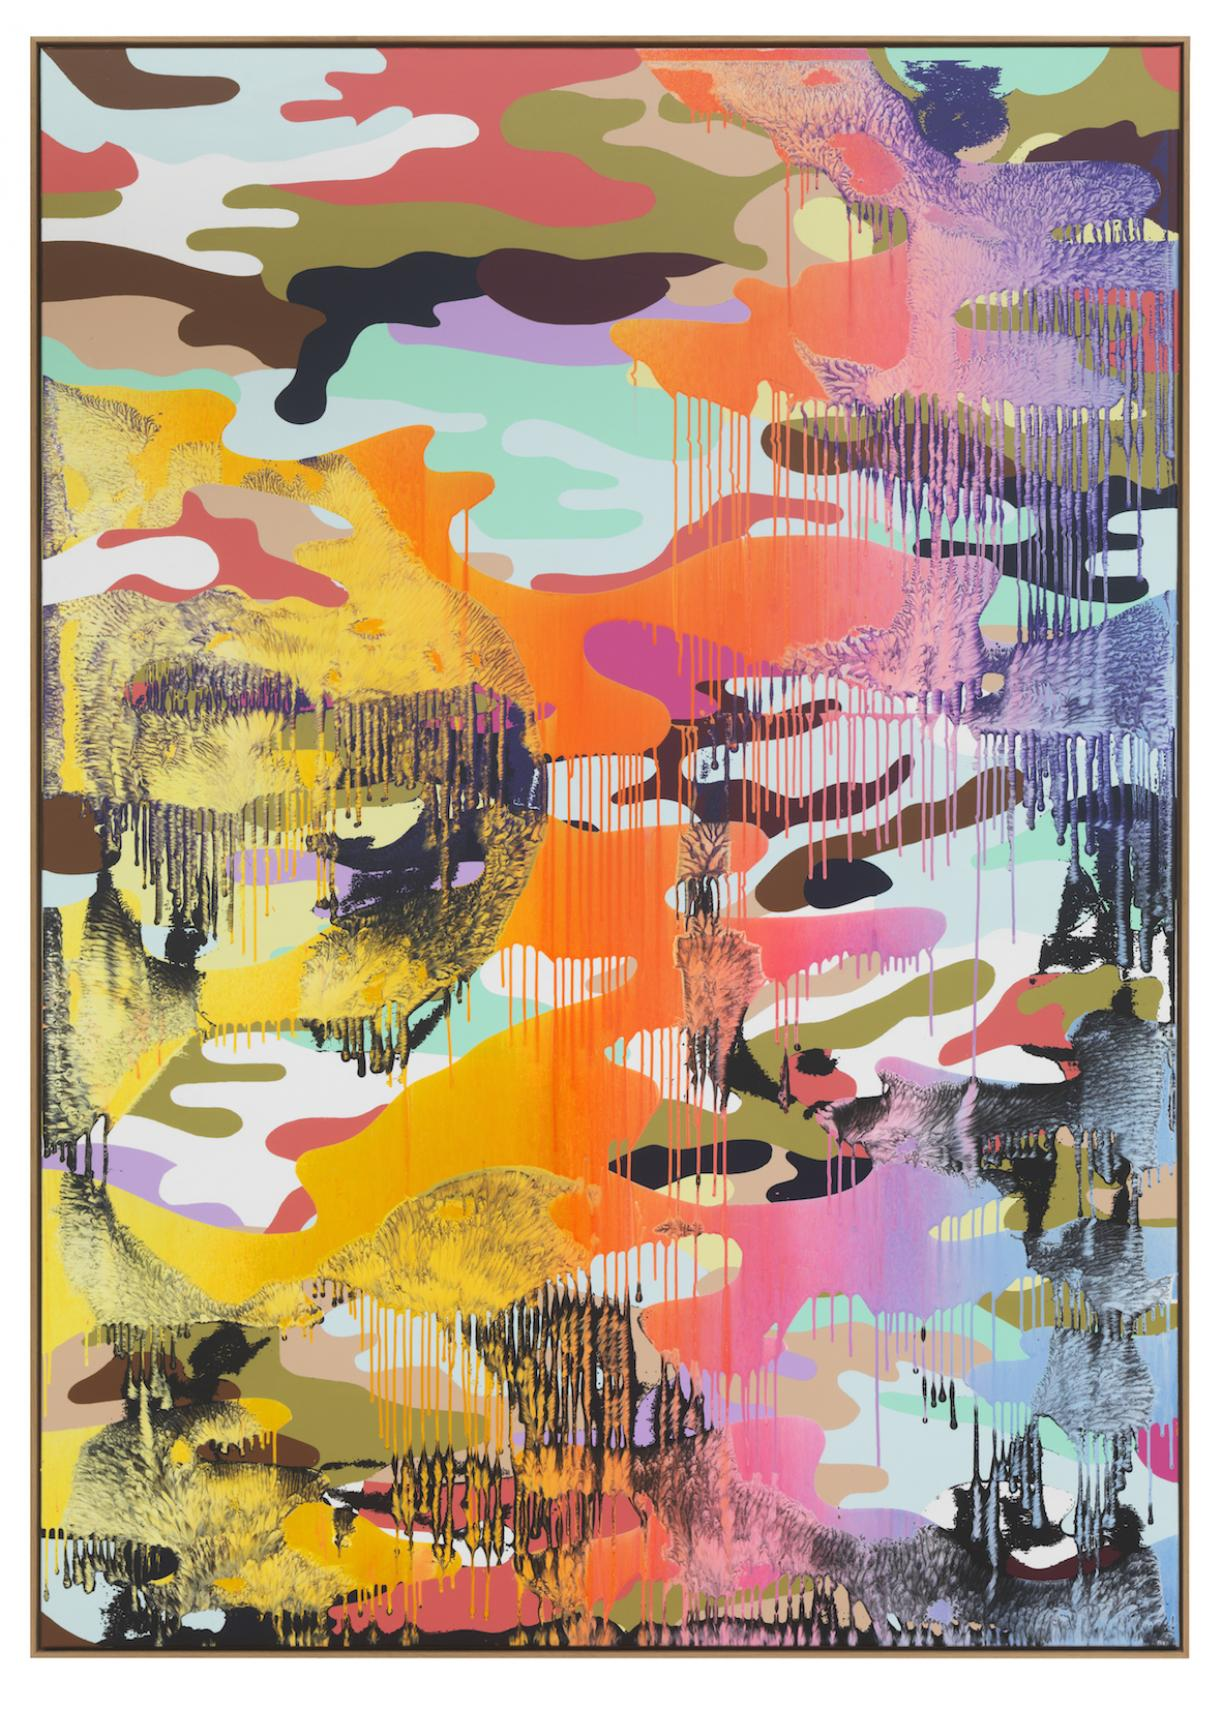 Christine Streuli, Warainting_012, 2016/17, Mixed media on canvas, 243,5 x 173 cm